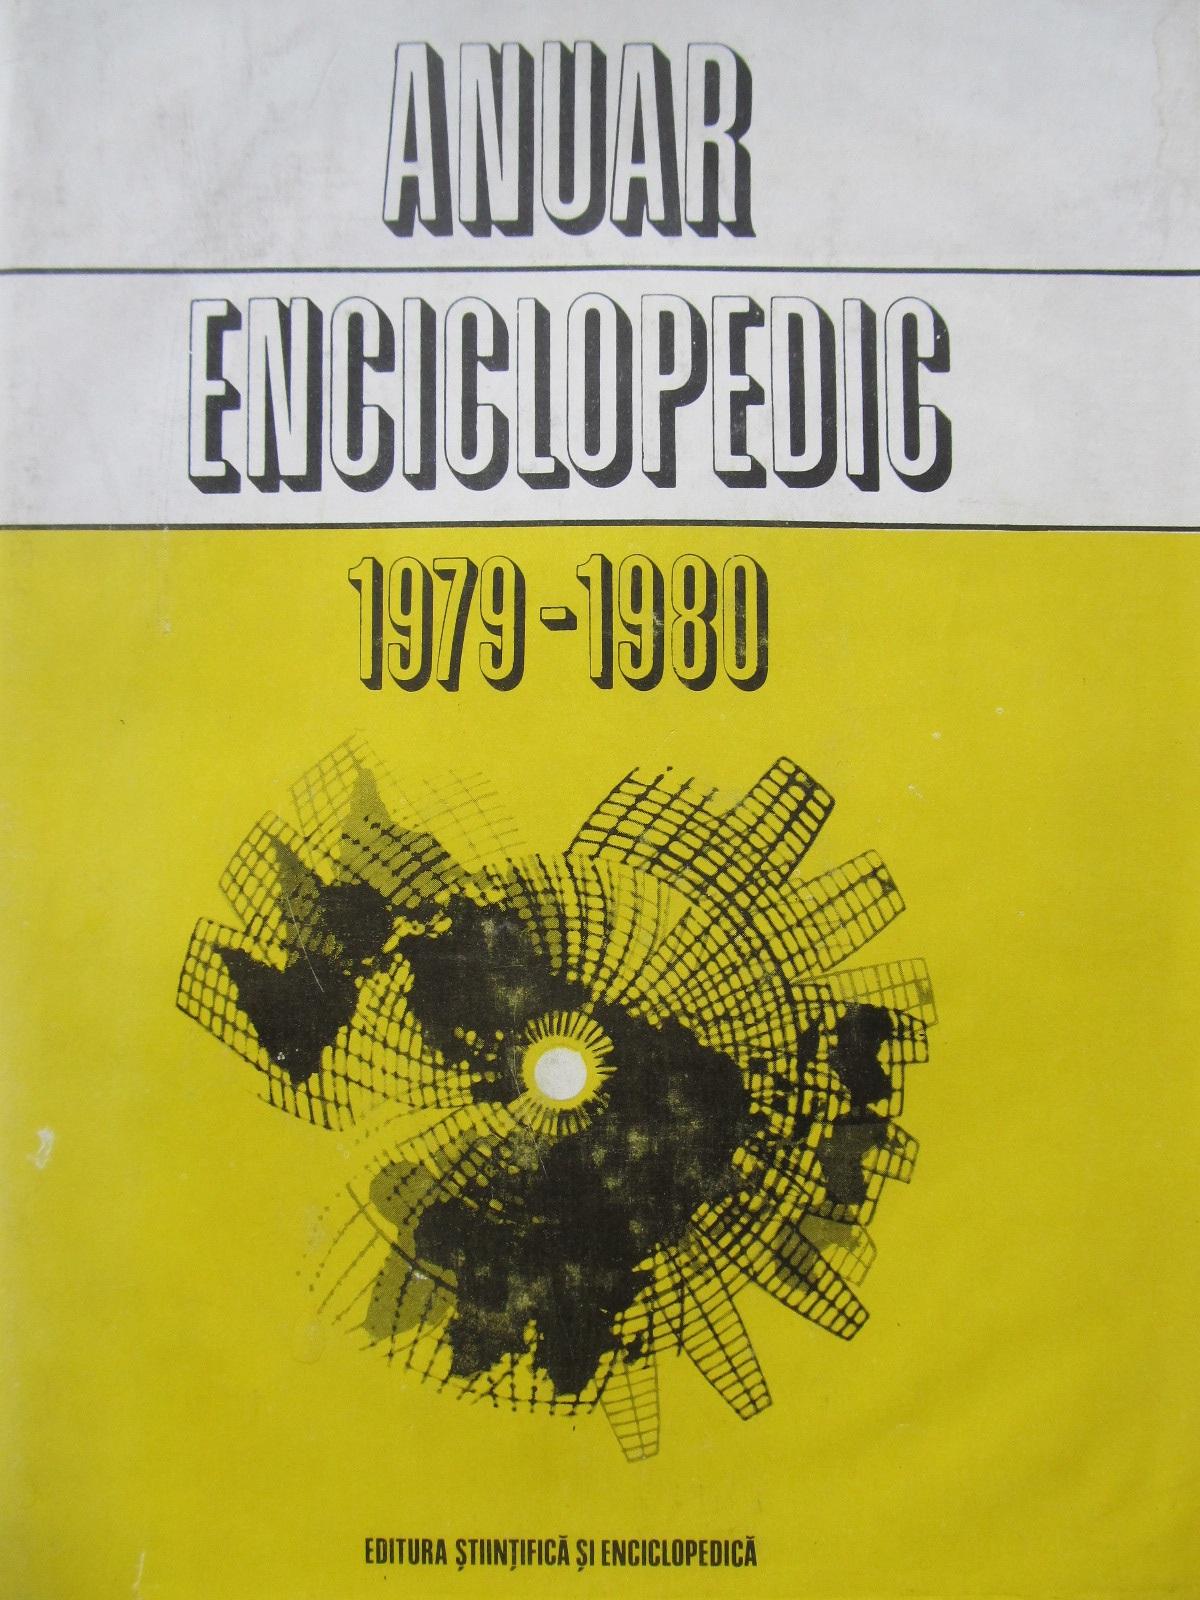 Anuar enciclopedic 1979-1980 - Aristita Avramescu | Detalii carte